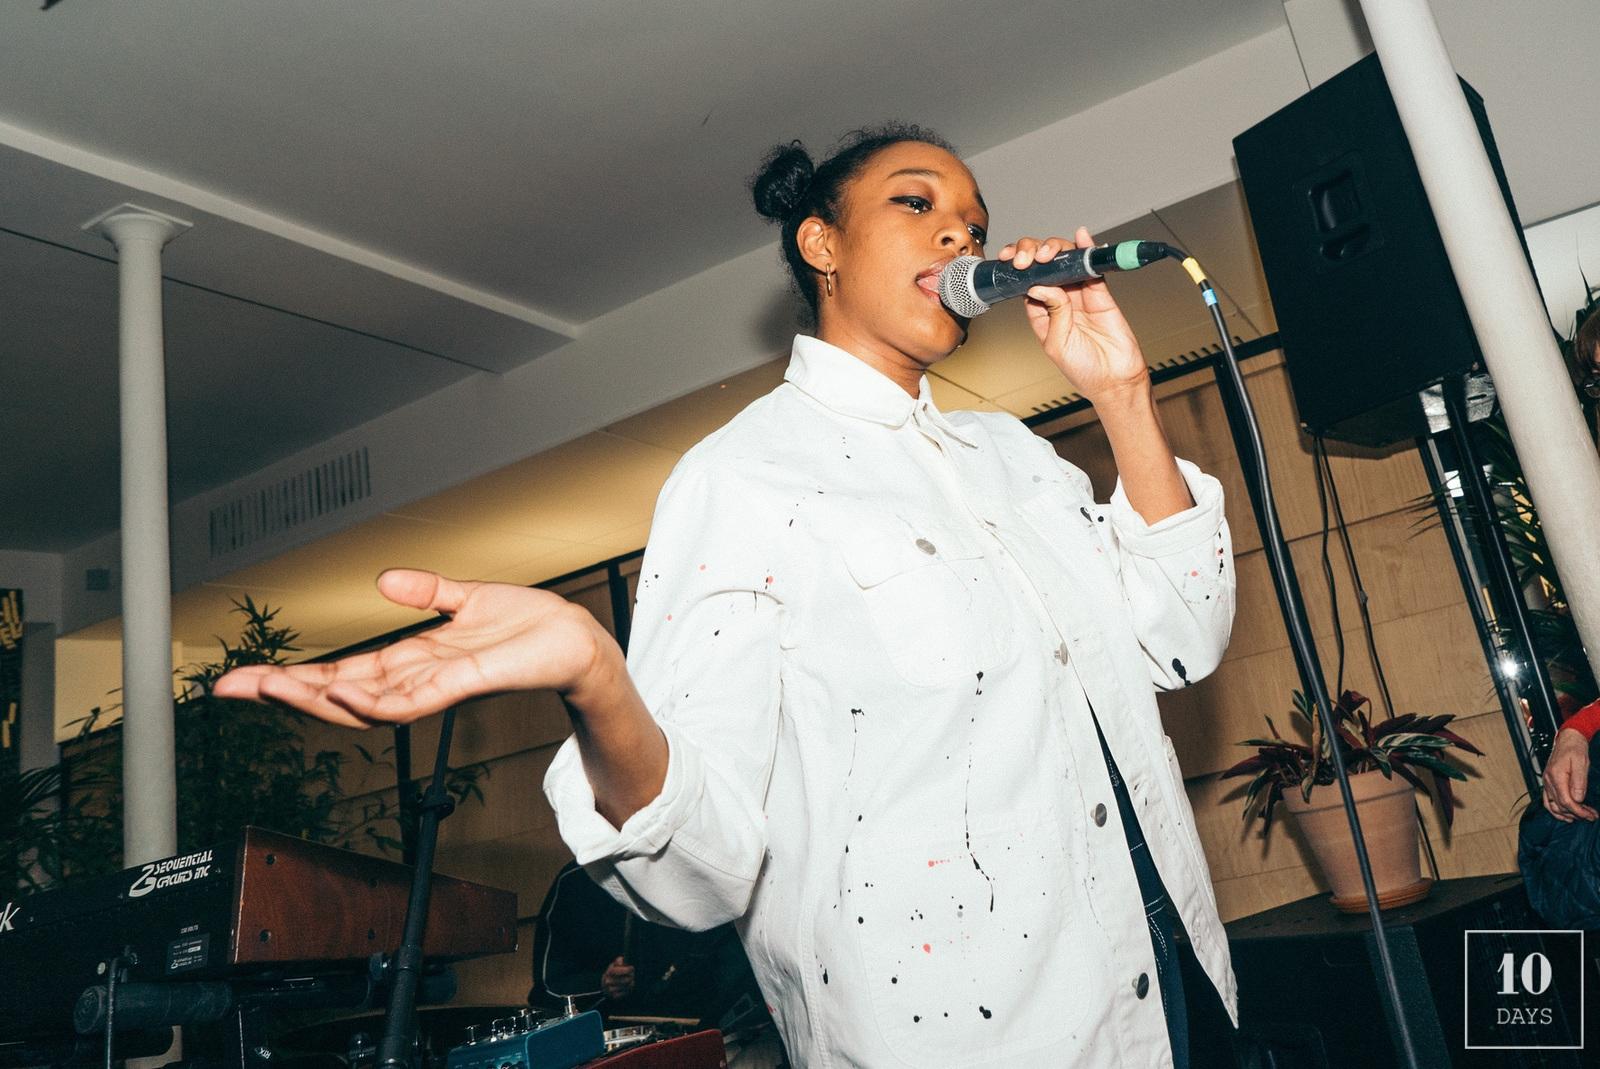 Fela Kuti x Carhartt WIP SS19 Capsule Collab Launching Party